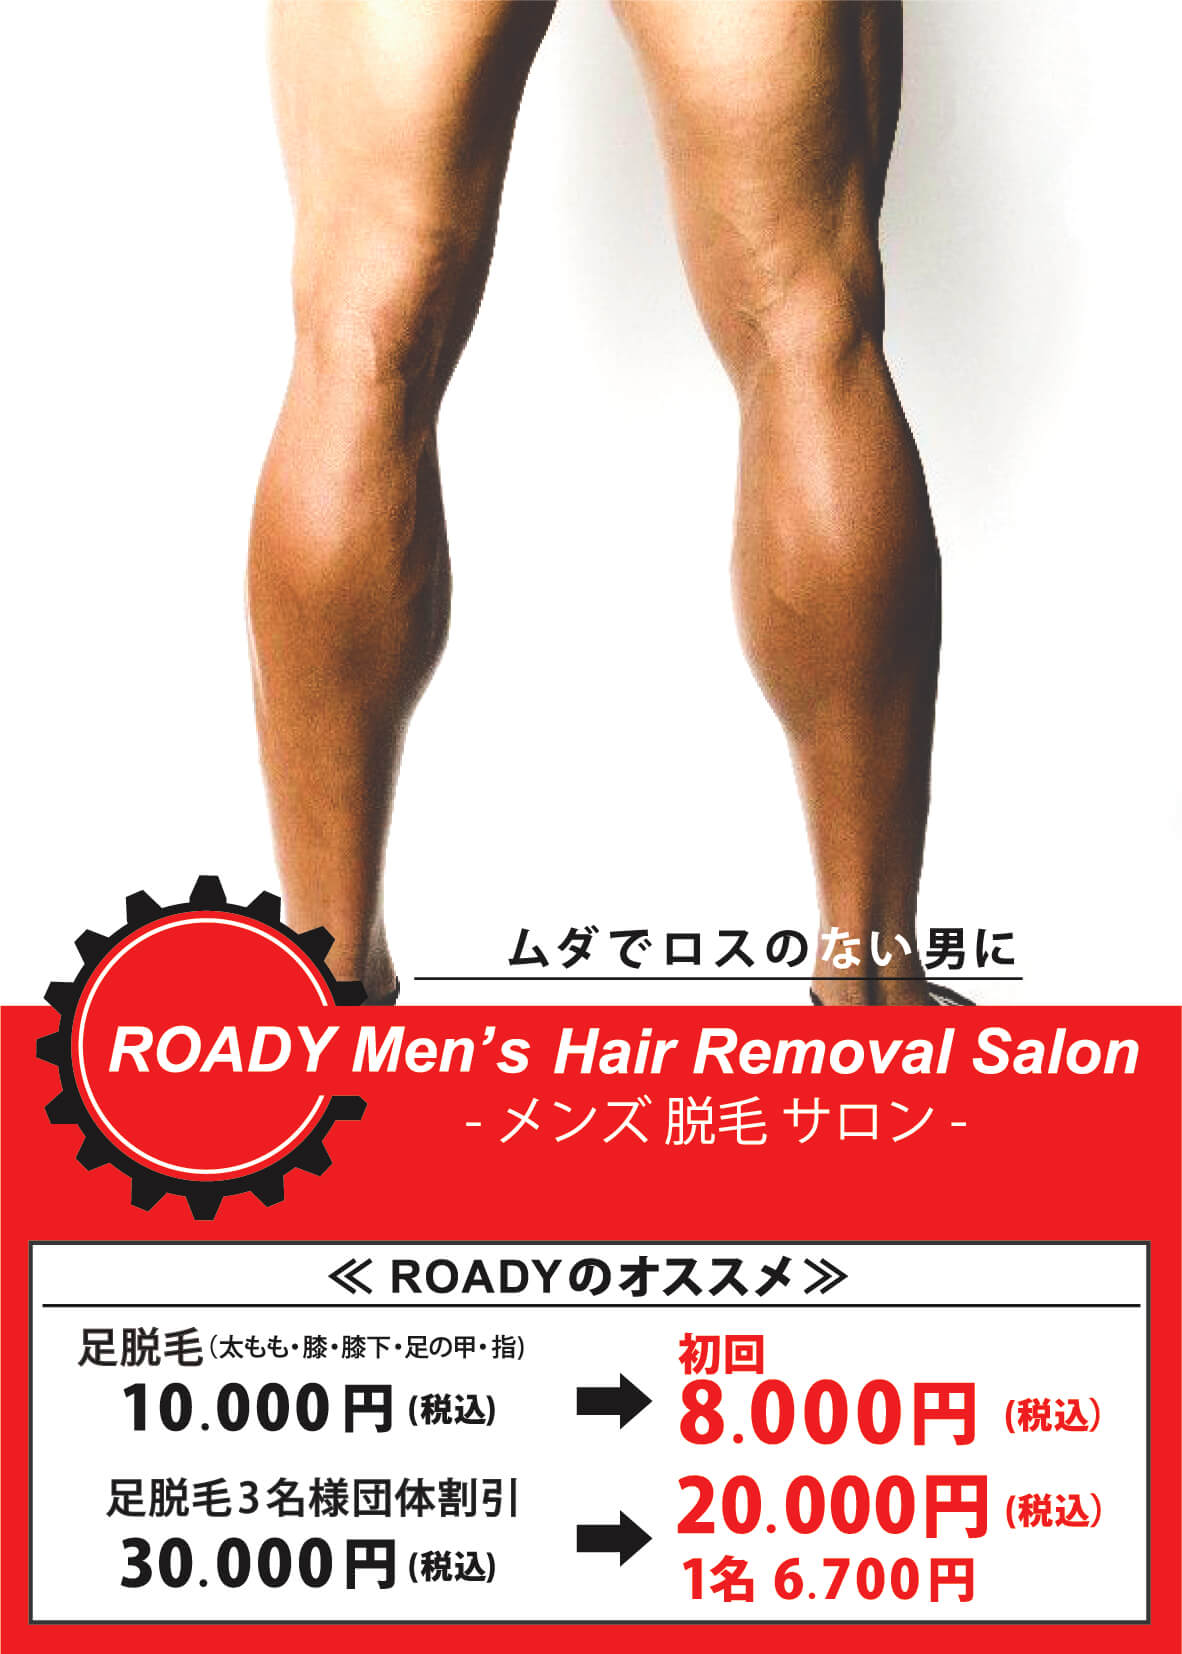 ROADY|メンズ脱毛サロン|キャンペーン・特典